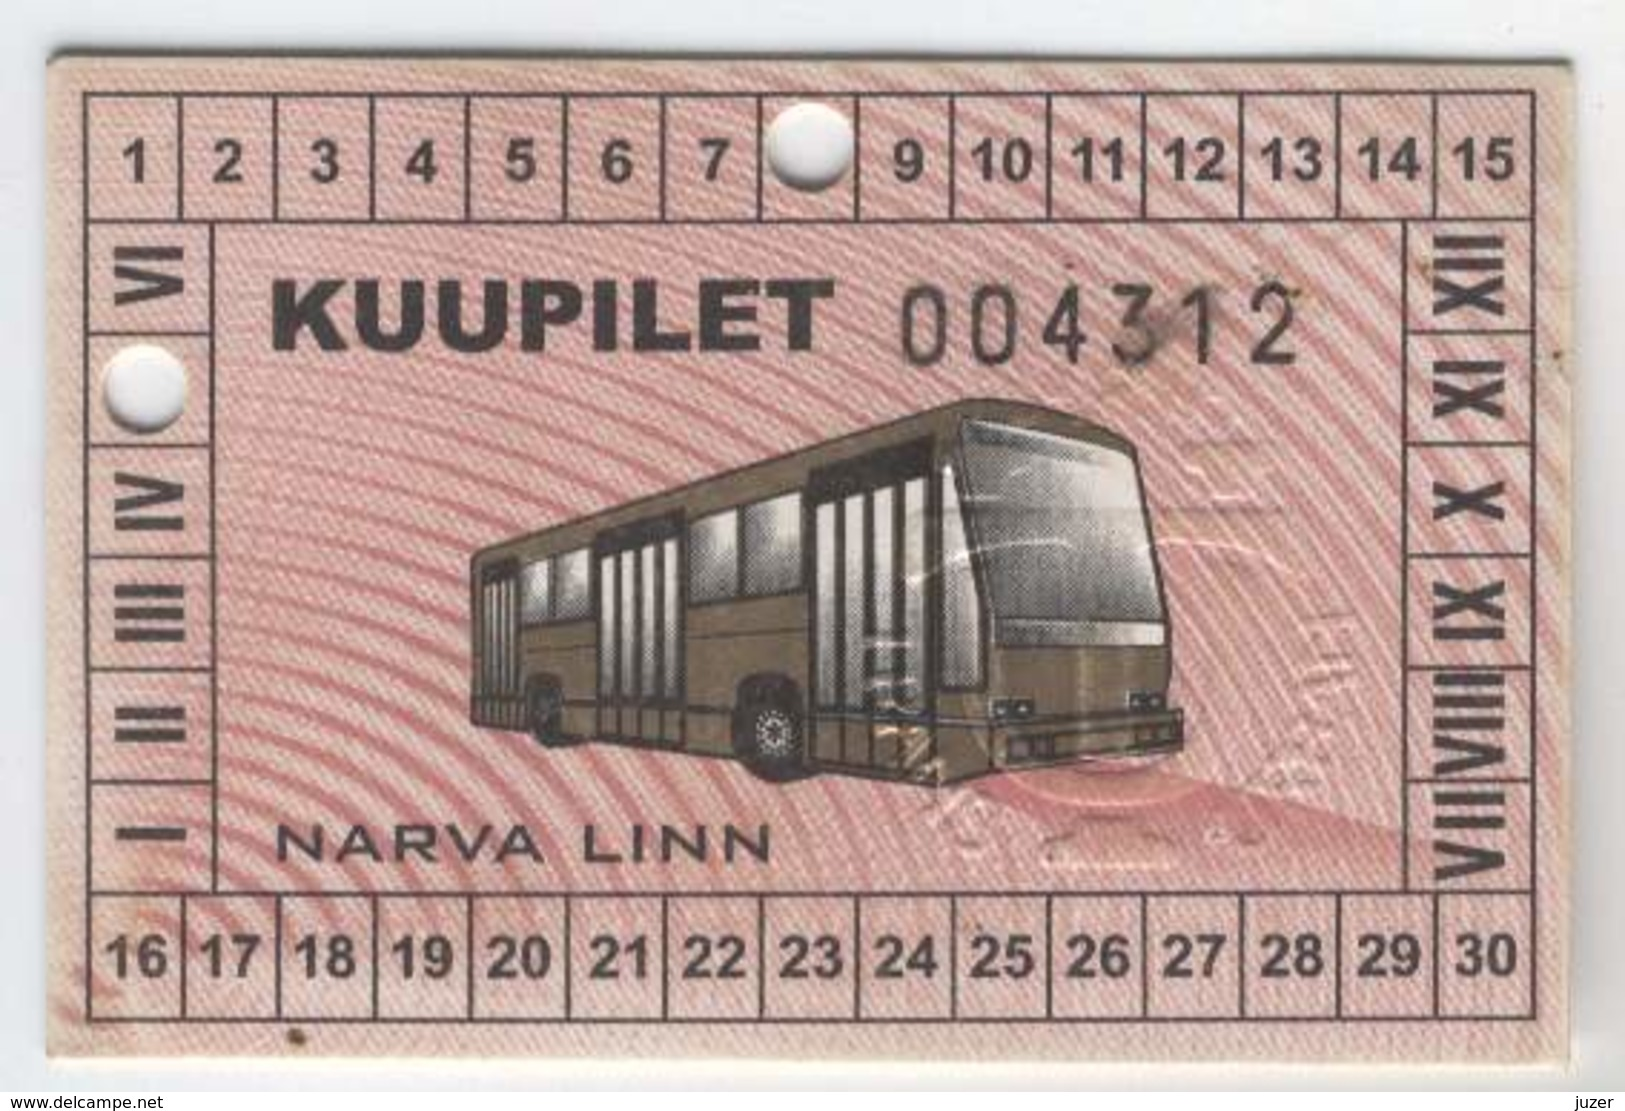 Estonia: Month Bus Ticket From Narva (6) - Season Ticket